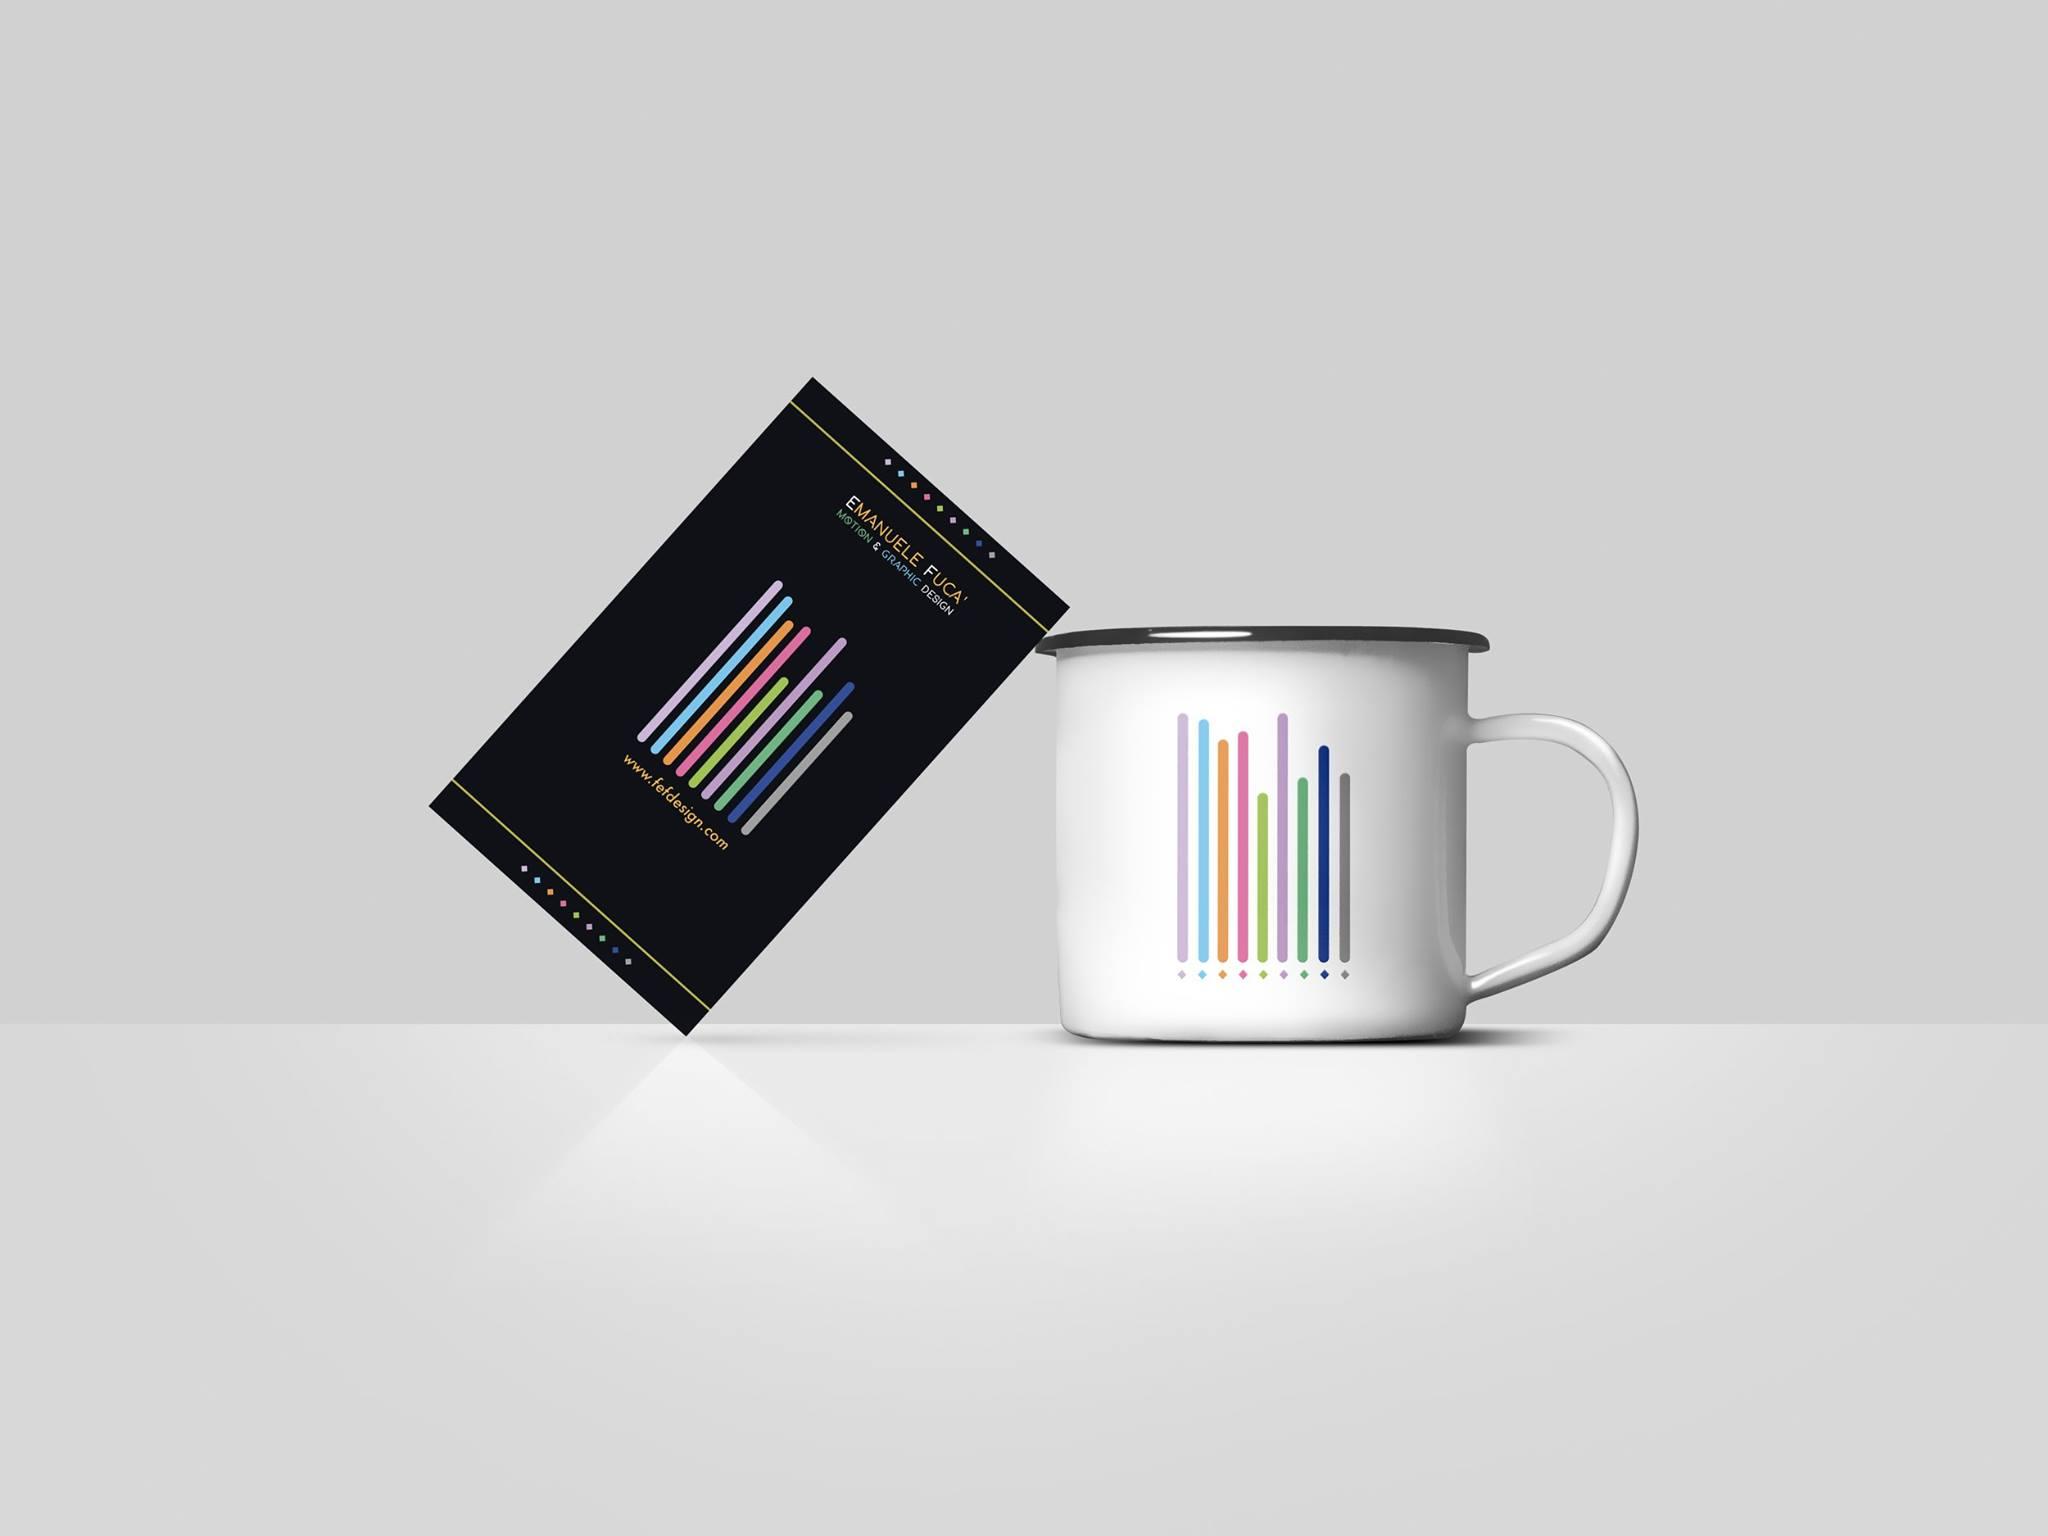 cup - fefdesign